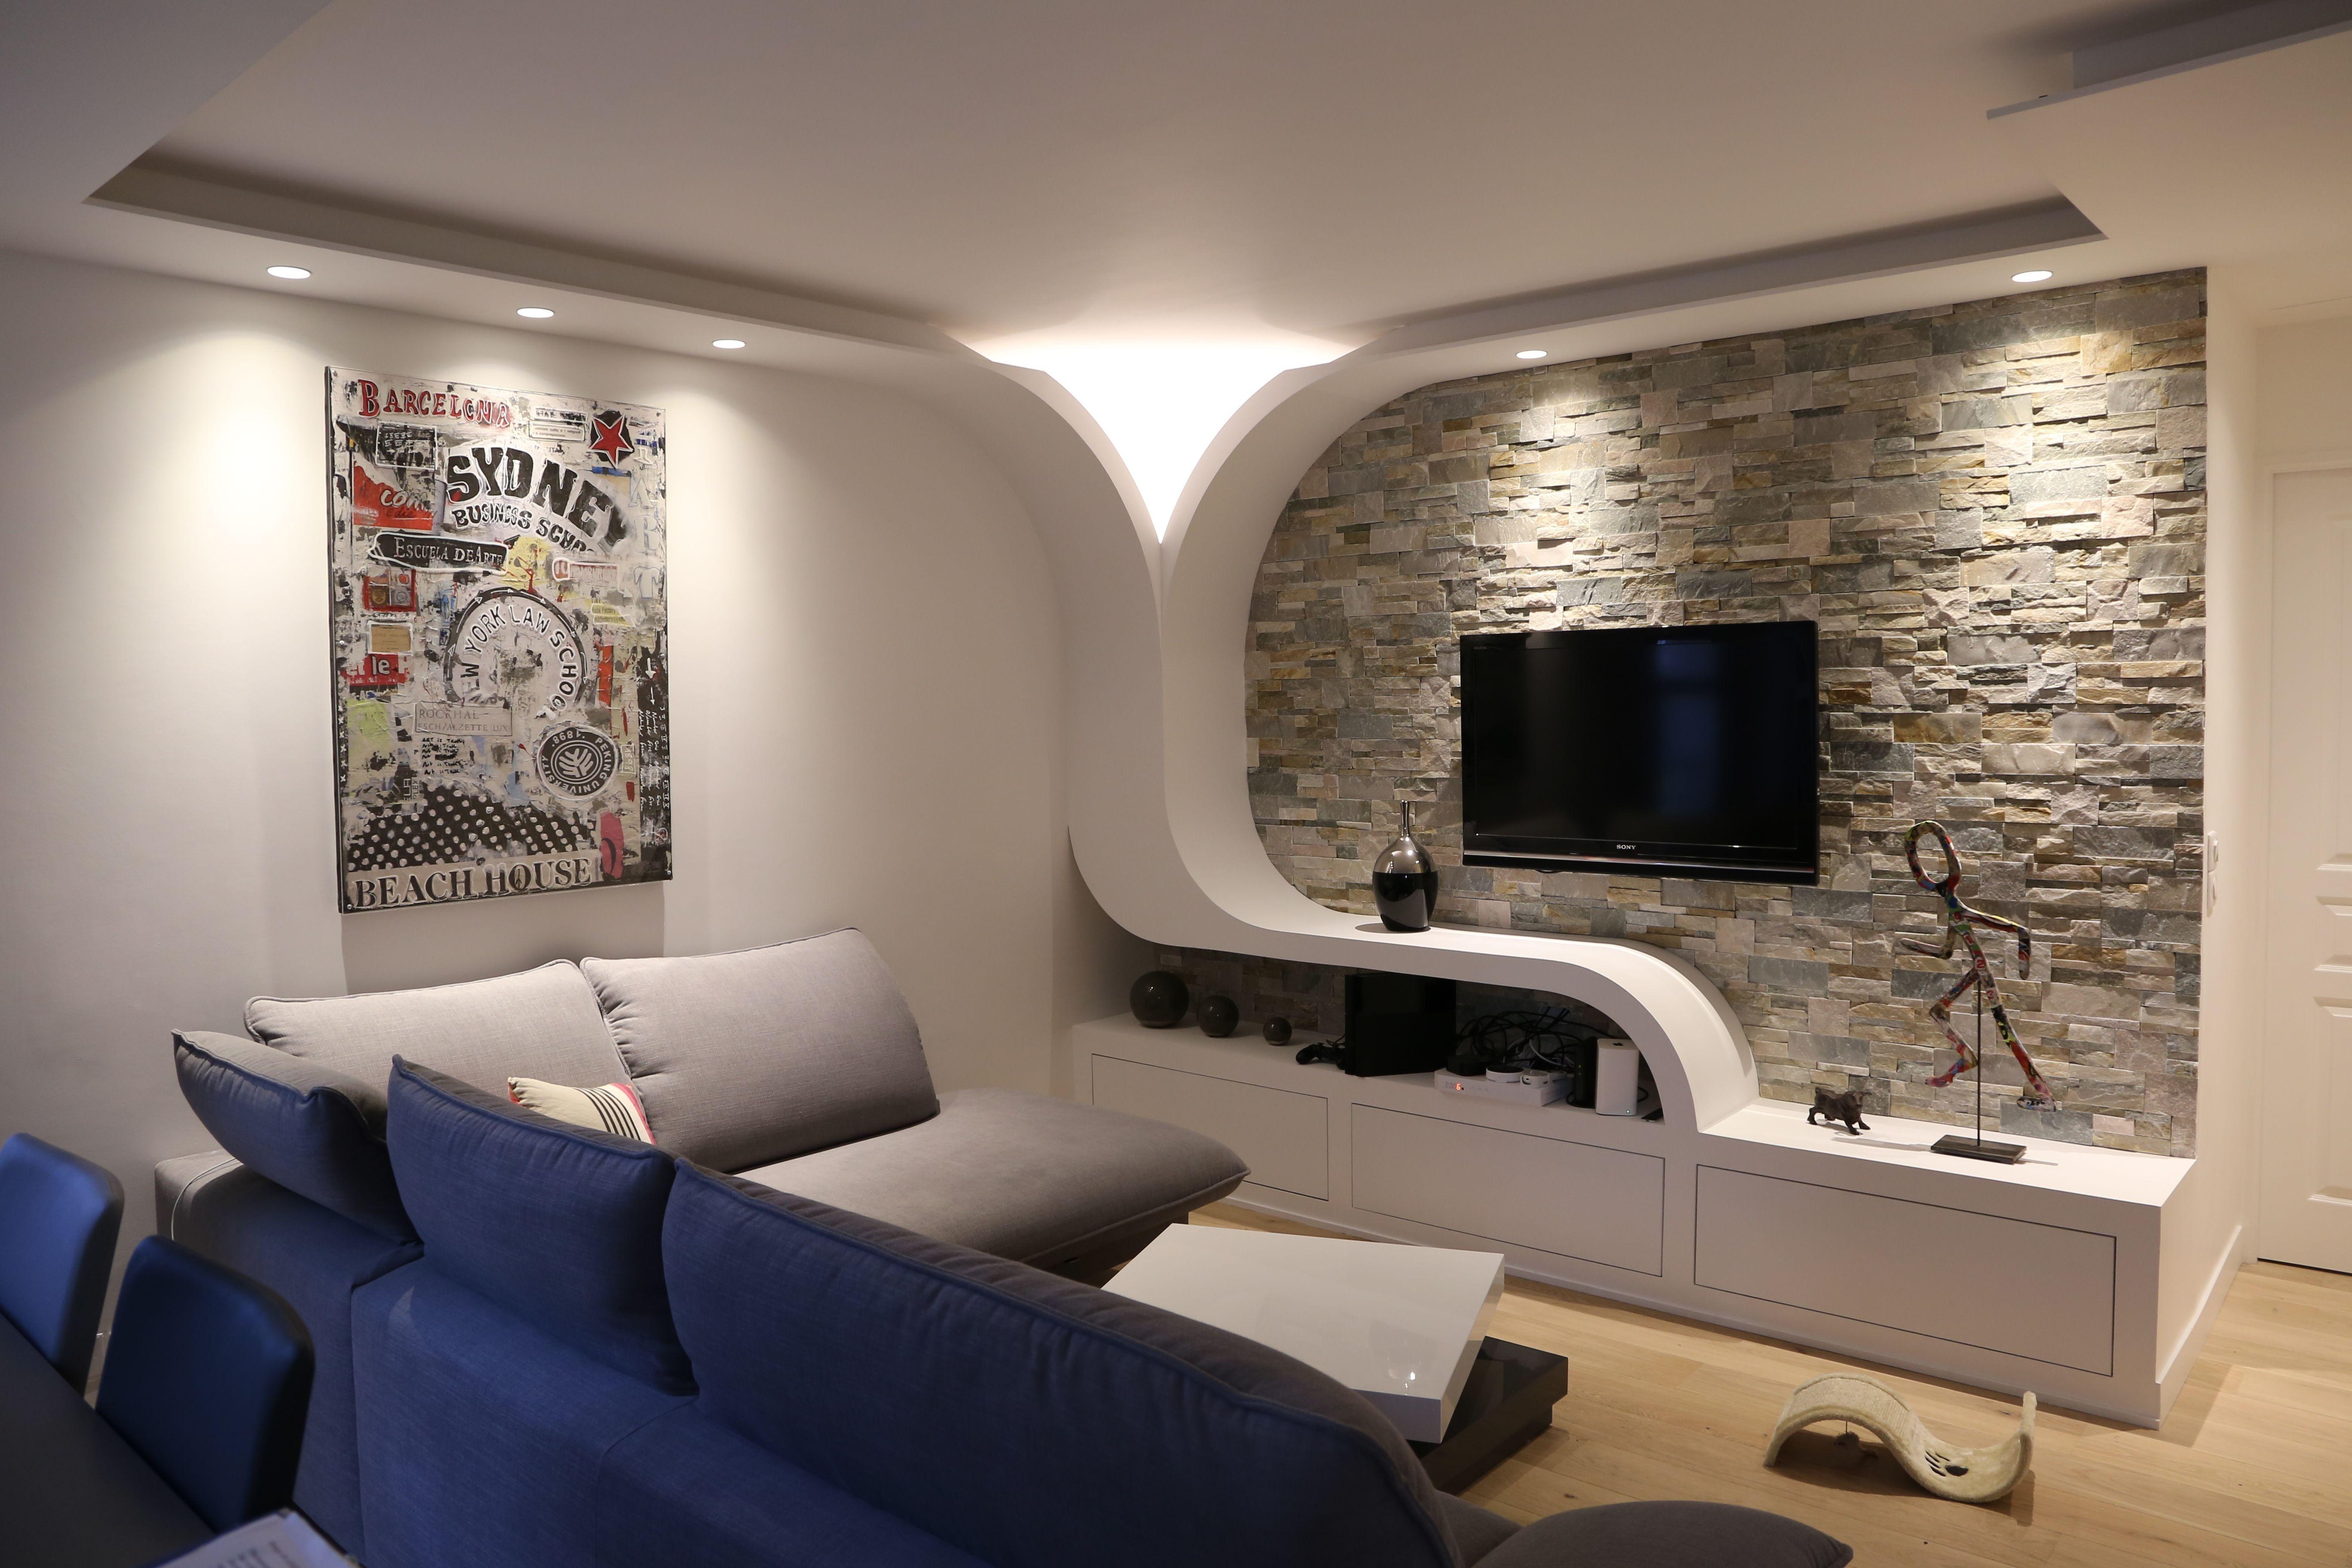 Redoutable Living Meuble Tv Ceiling Design Living Room Plafond Design Living Room Decor Inspiration